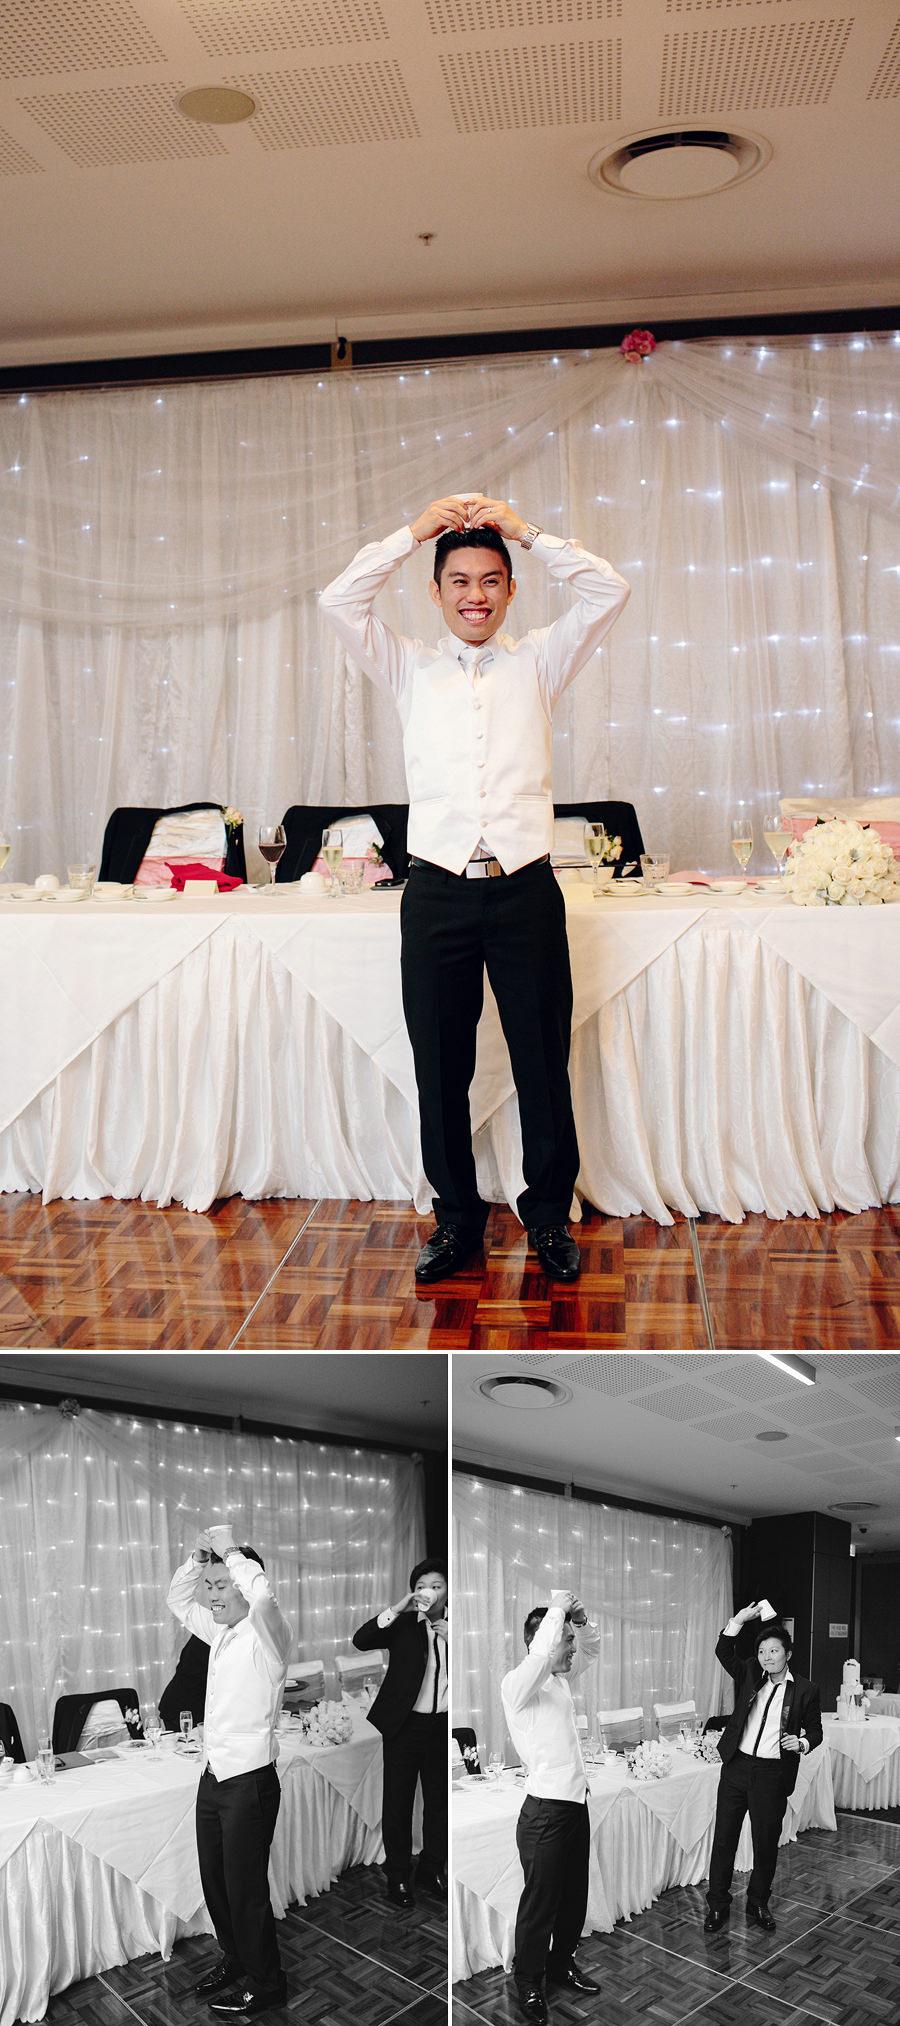 Phoenix Wedding Photographers: Magic show